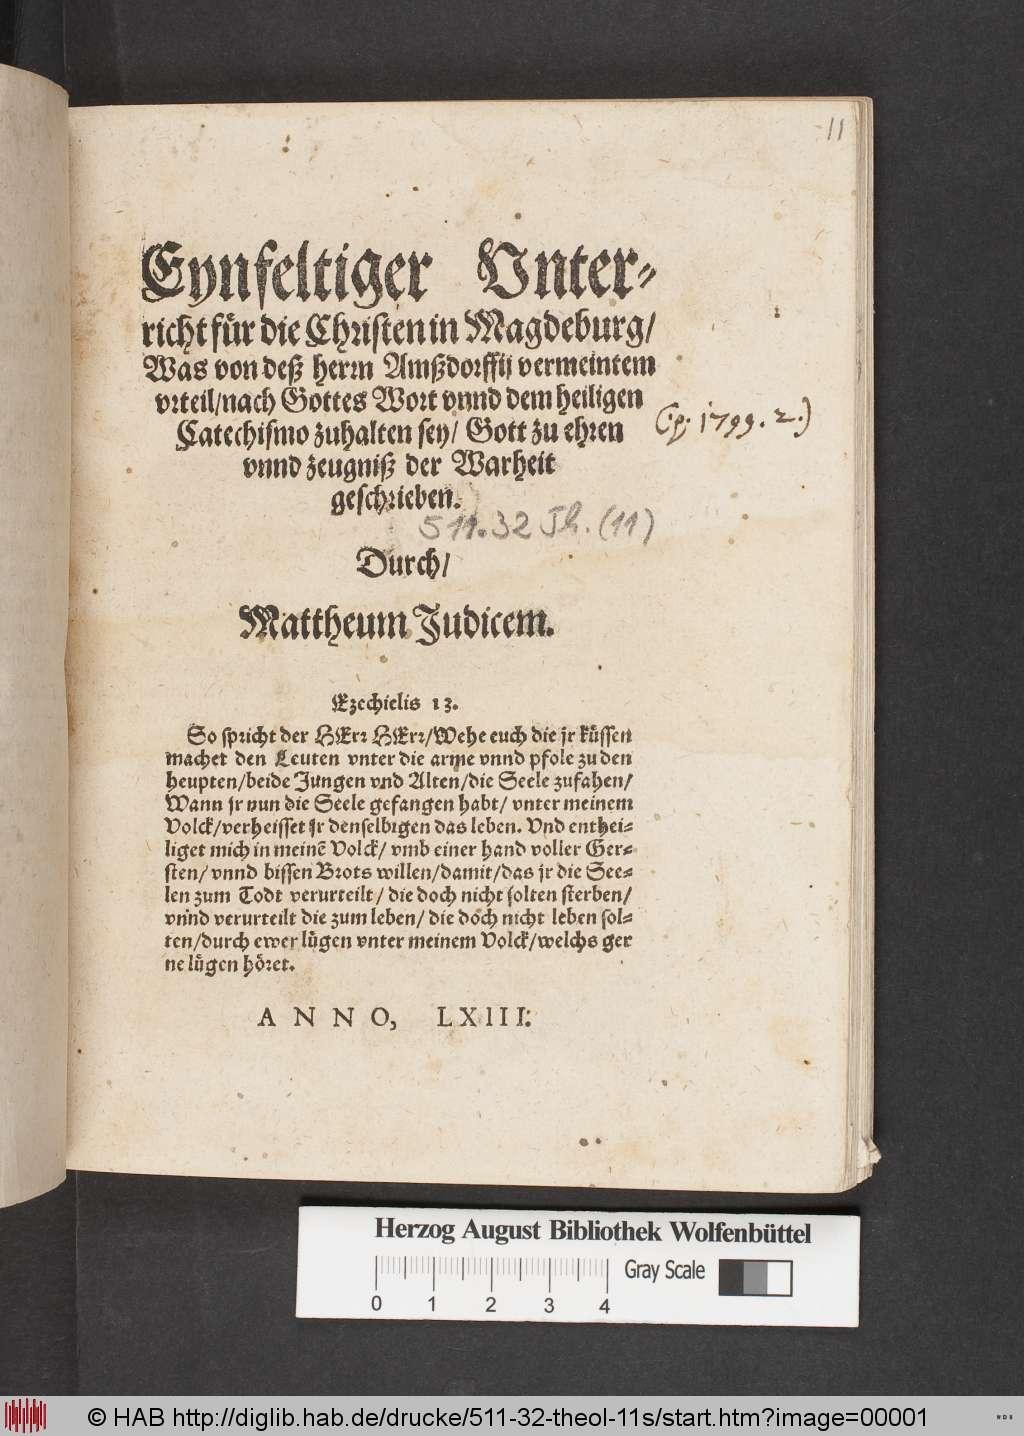 http://diglib.hab.de/drucke/511-32-theol-11s/00001.jpg